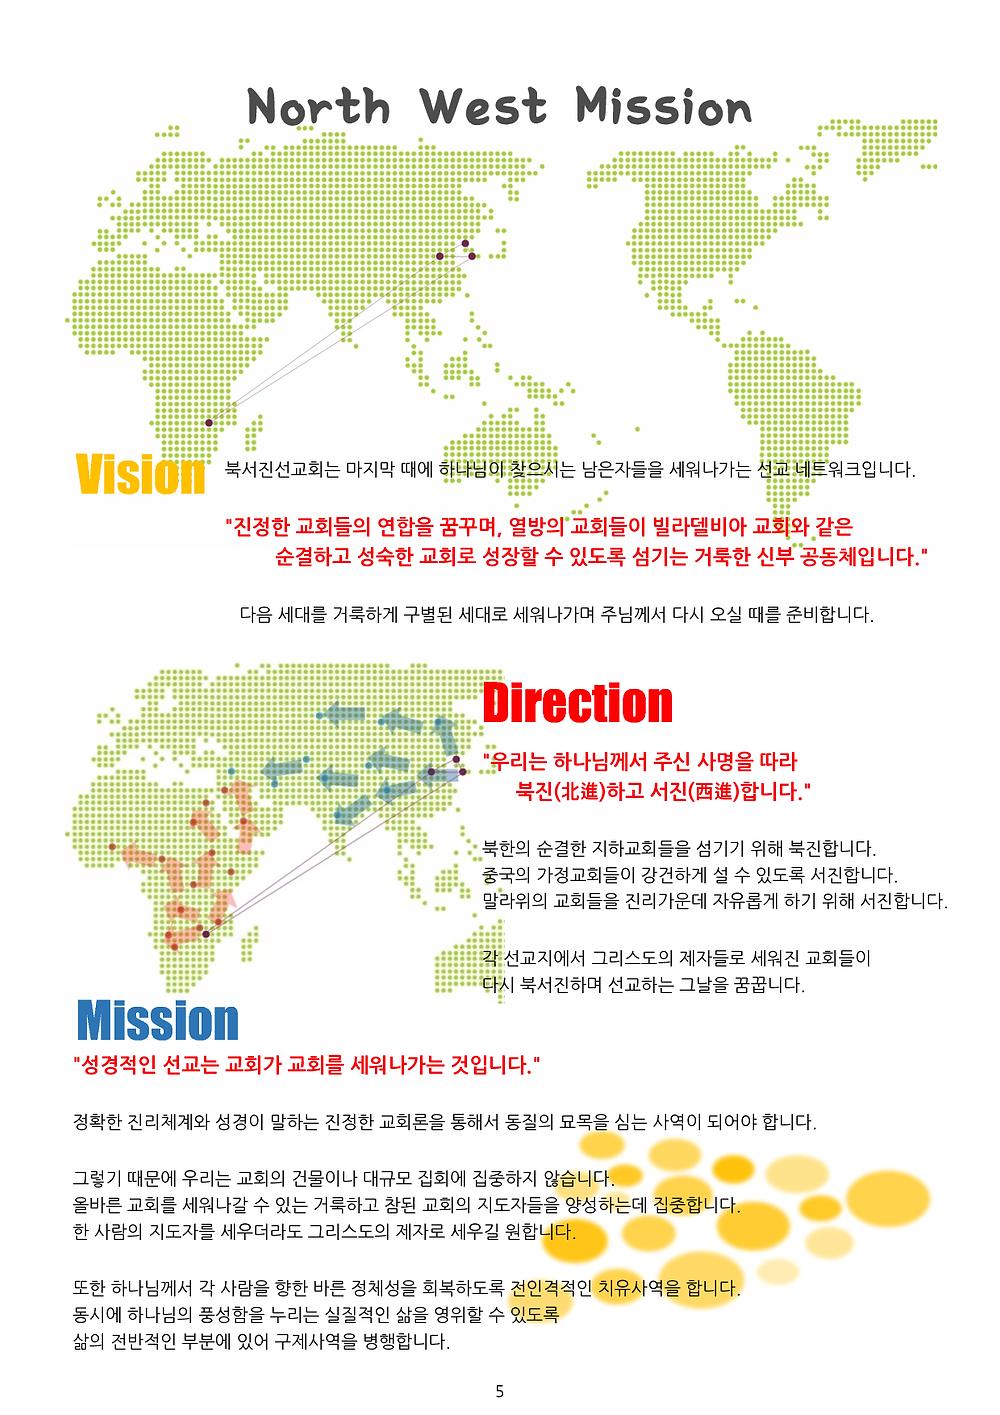 NWM 2014년 선교보고_5.png